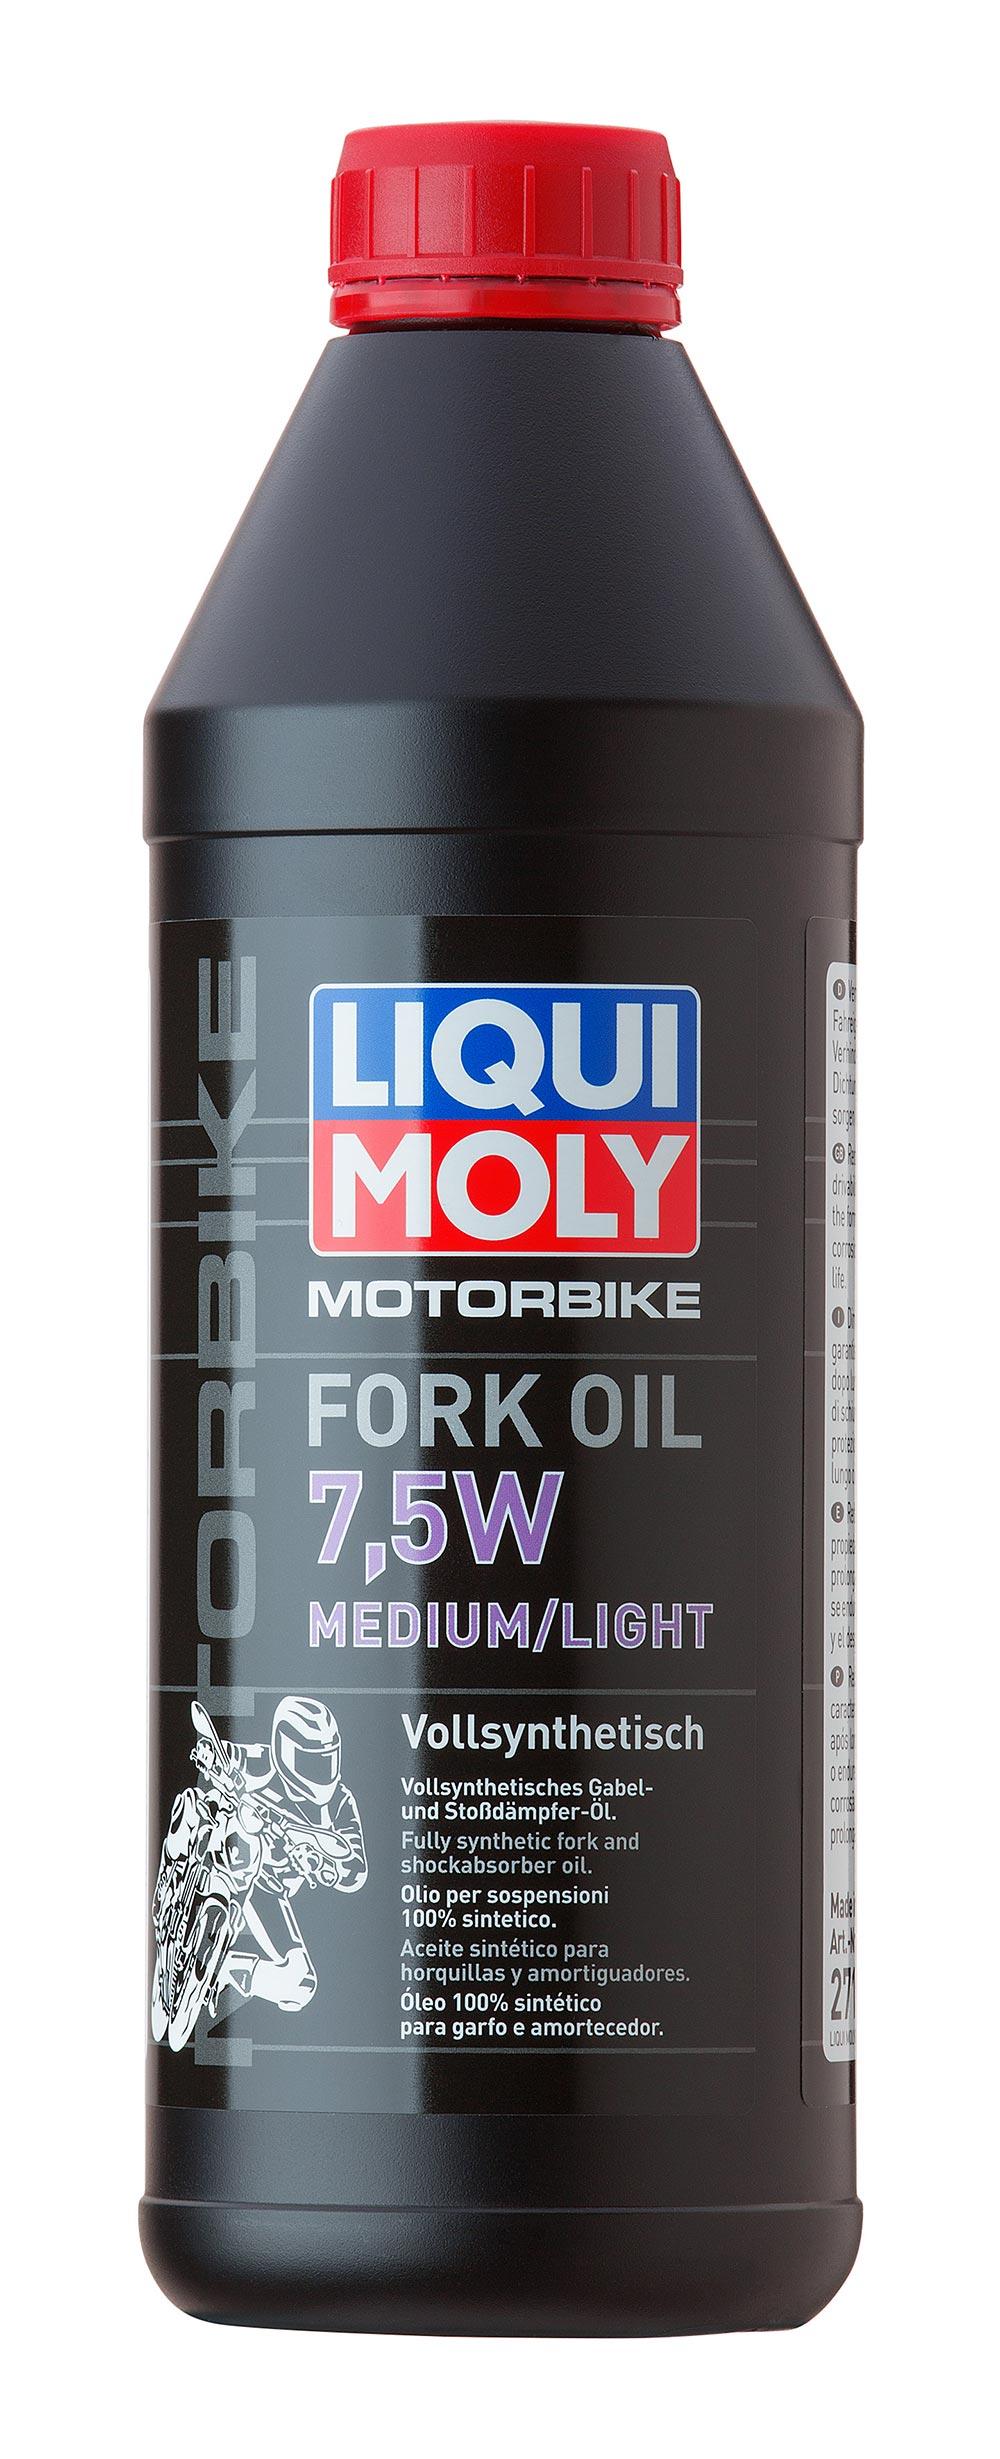 Масло моторное синт. Motorbike Fork Oil Medium/Light 7.5W 7.5 (1л)